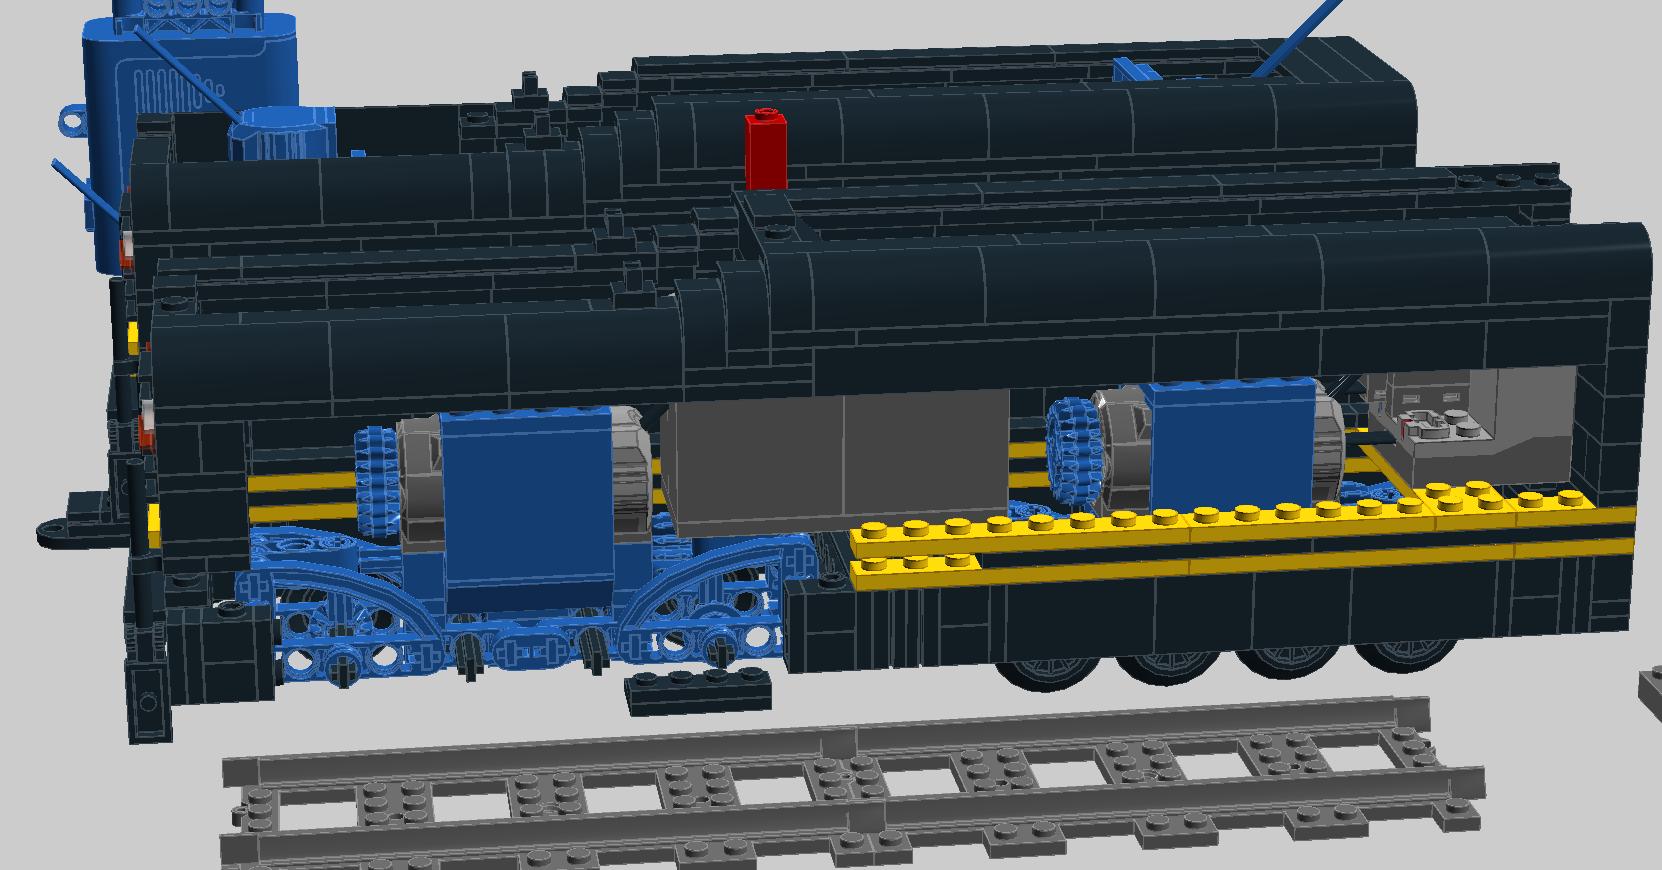 Lego Prr T1 – Wonderful Image Gallery